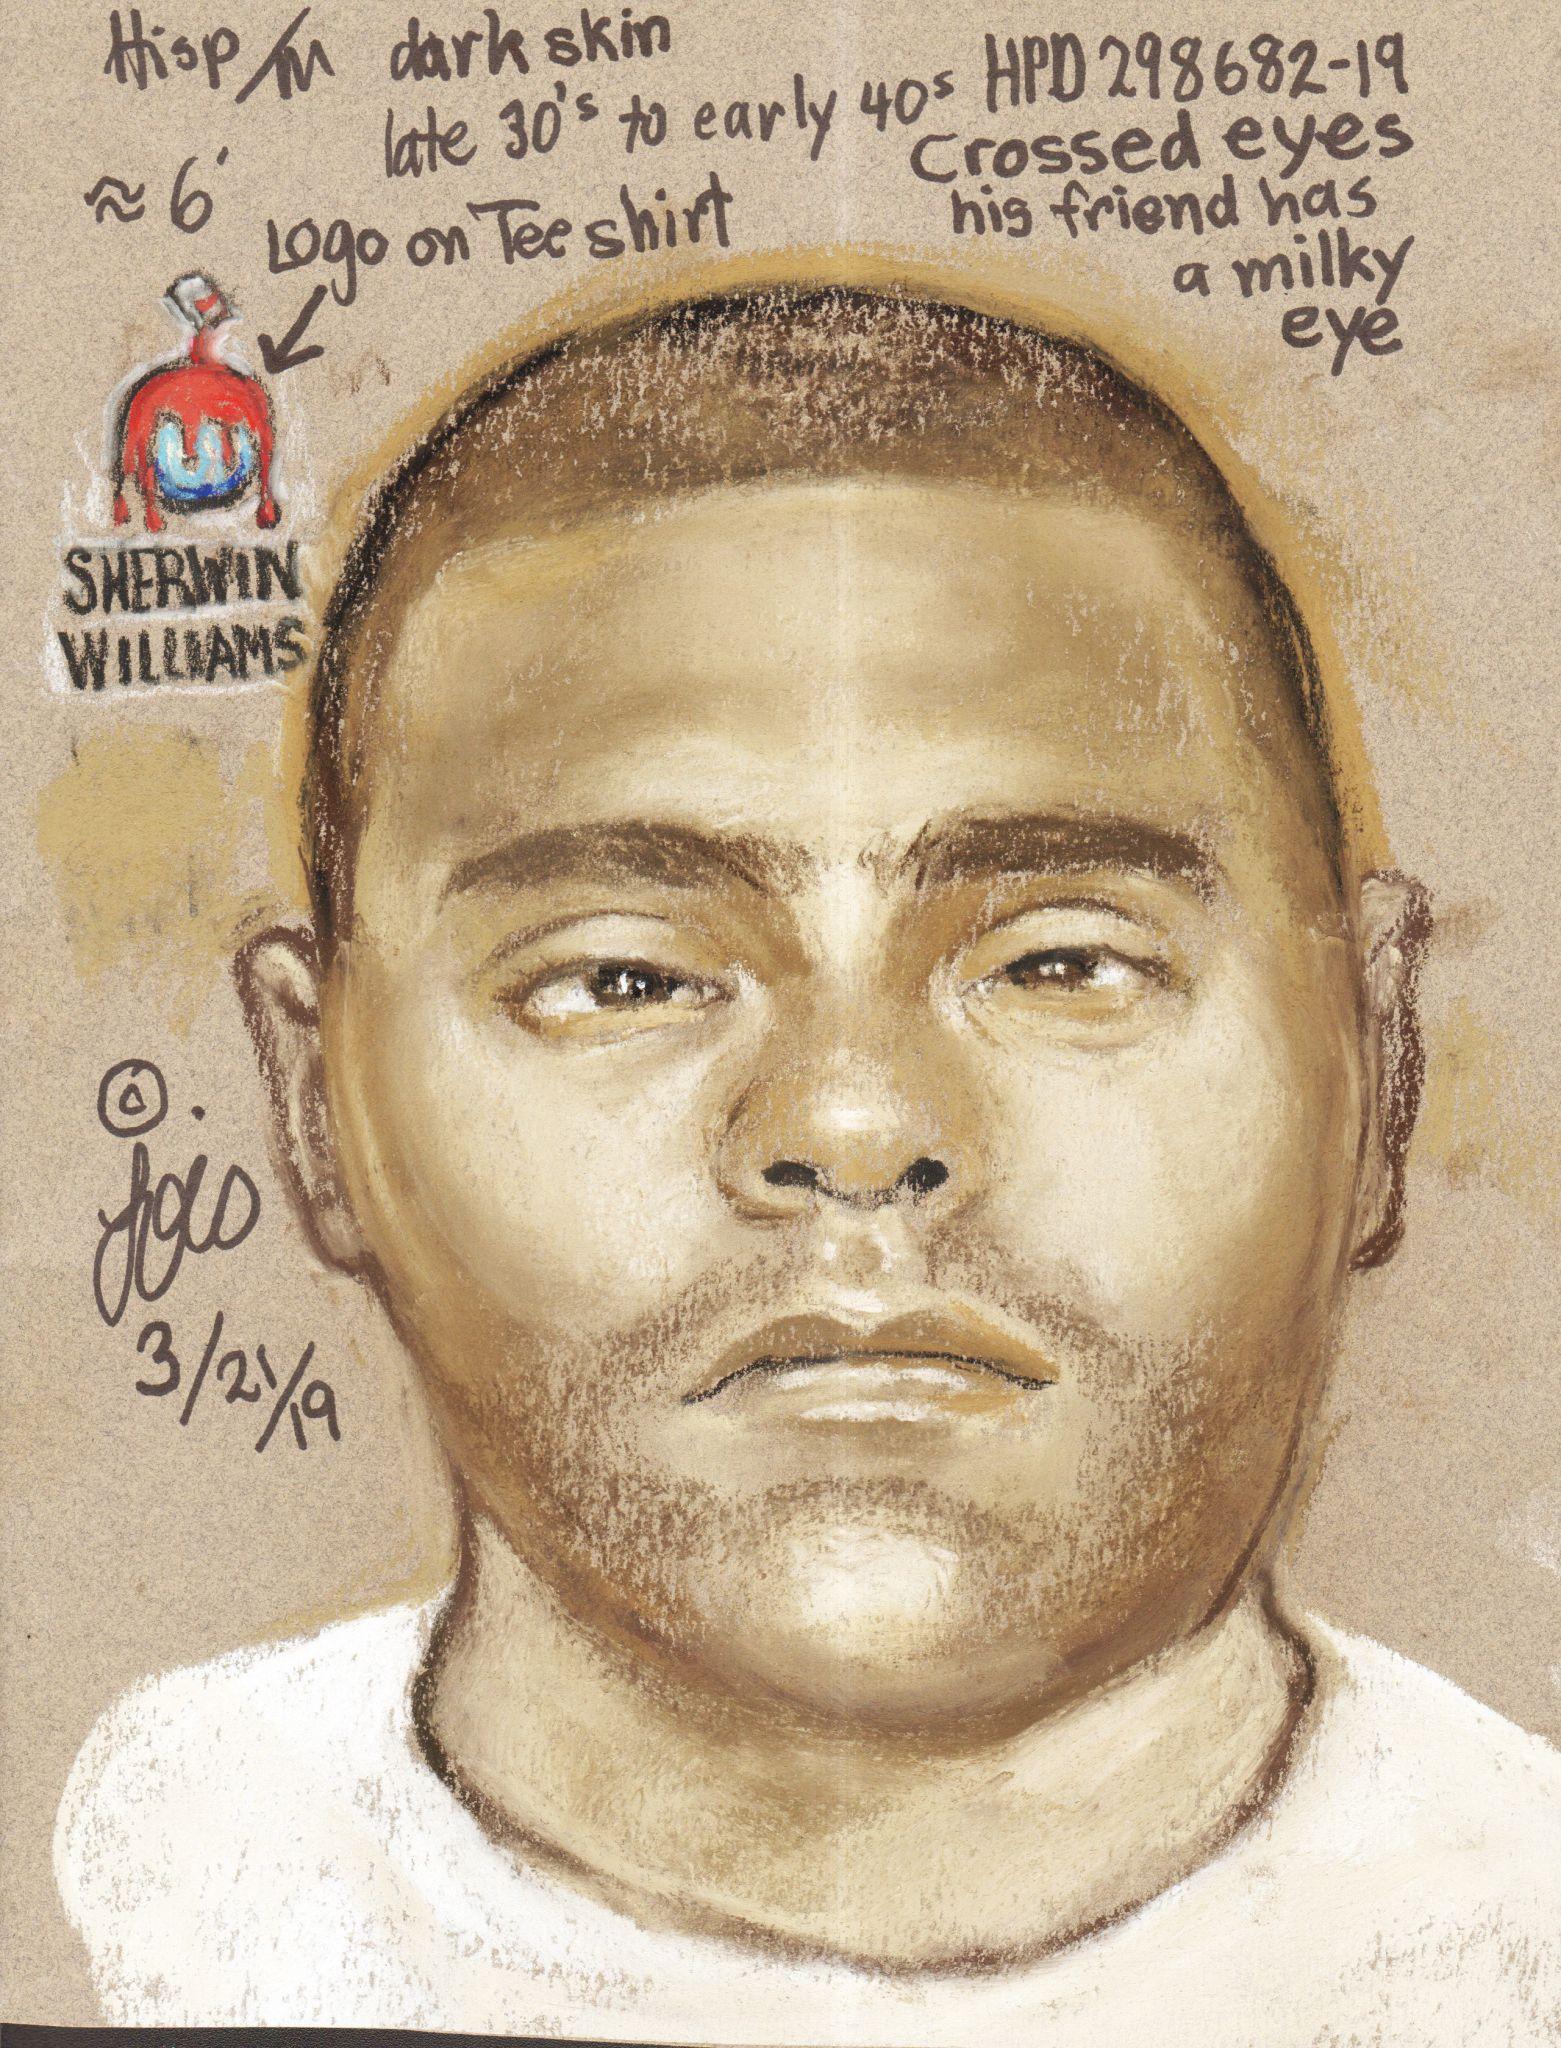 HPD: Cross-eyed suspect accused of killing 2 outside Houston bar